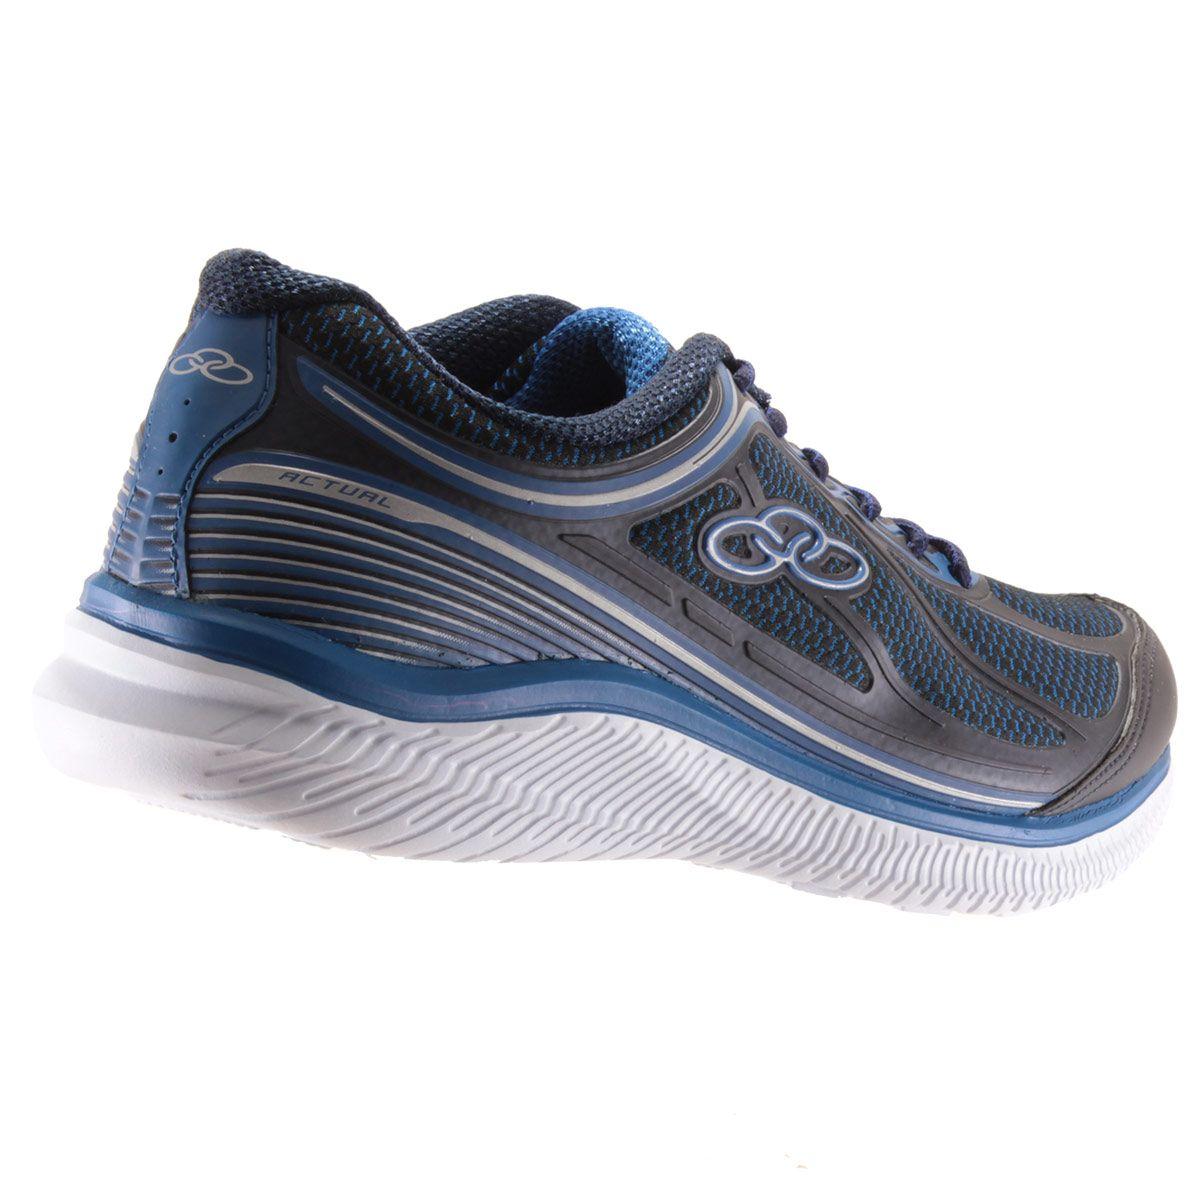 Tênis Olympikus Actual Masculino Caminhada Corrida 422